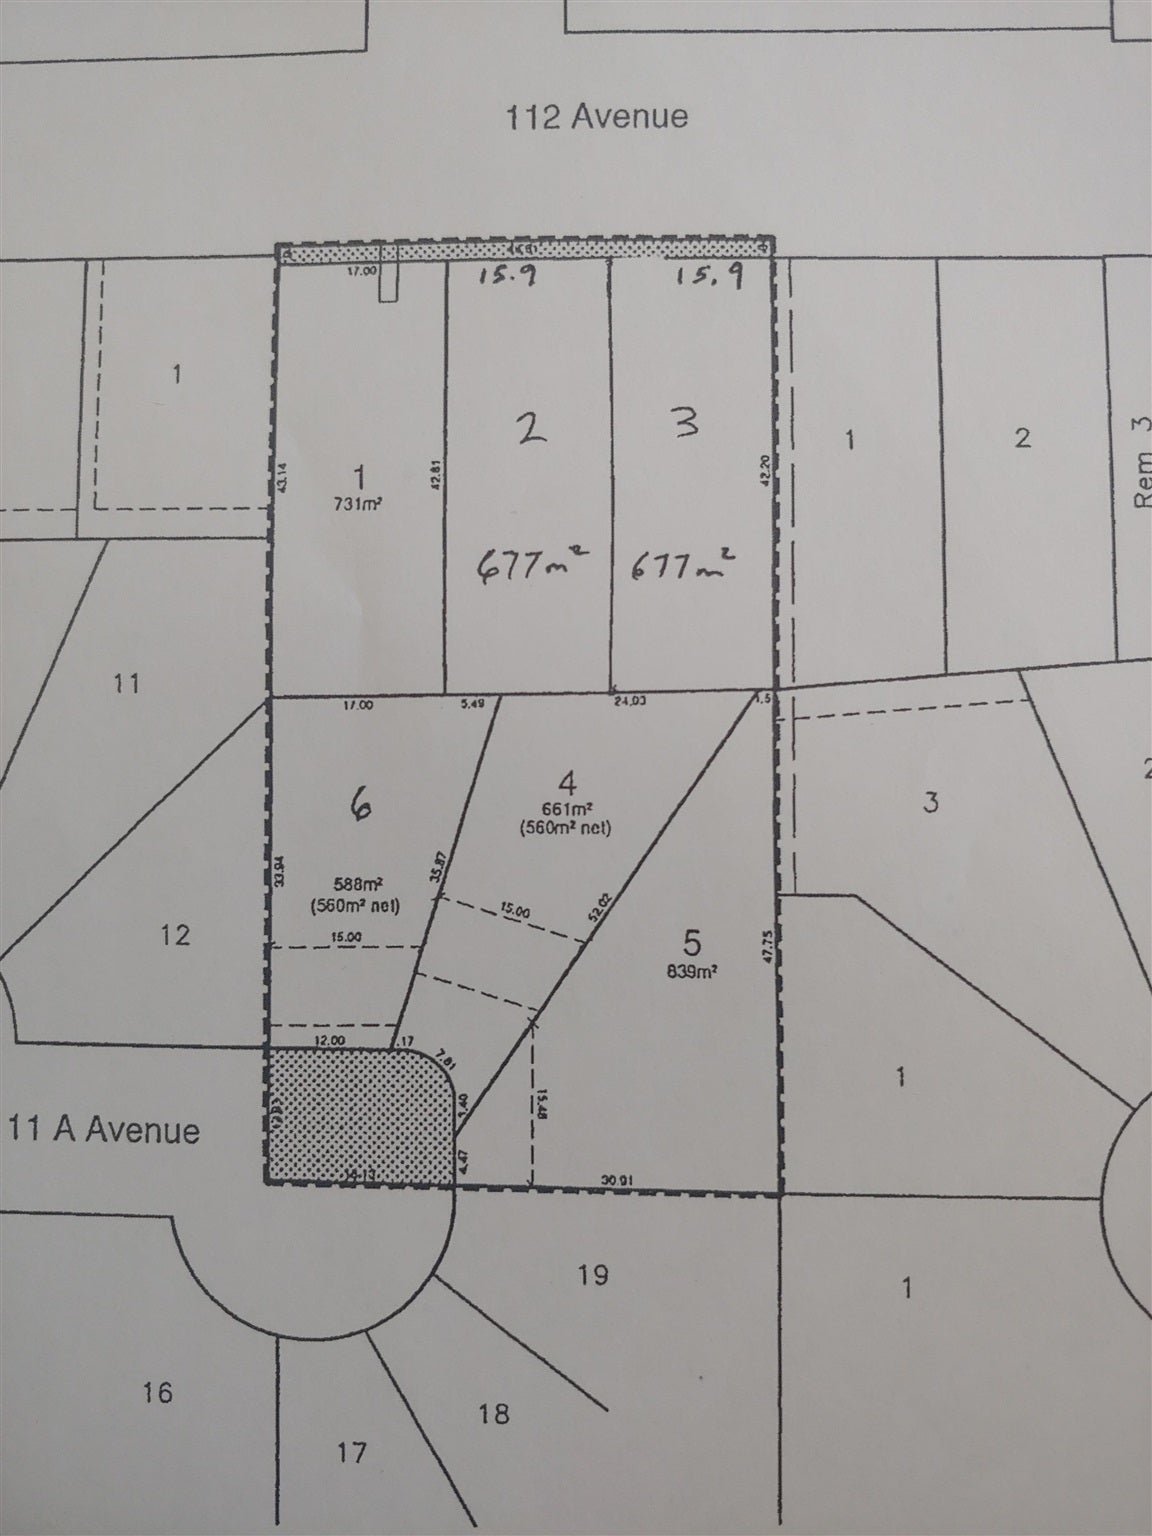 15864 112 AVENUE - Fraser Heights for sale(R2596945)